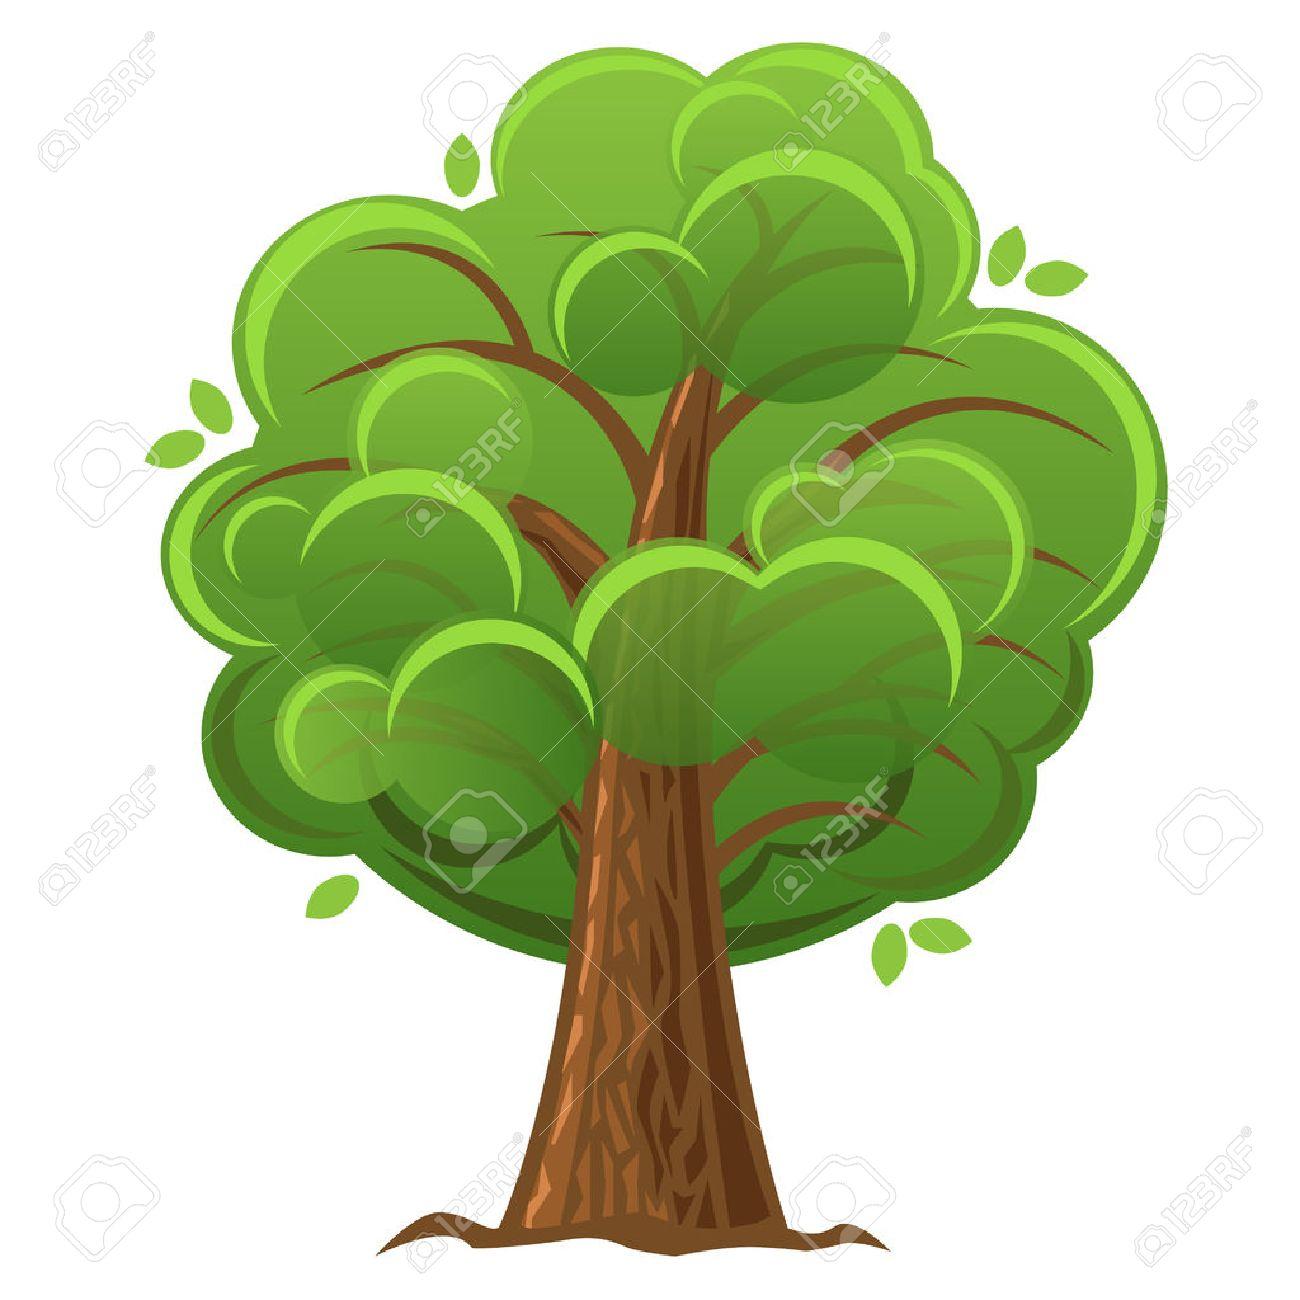 cartoon tree green oak tree with luxuriant foliage vector rh 123rf com oak tree cartoon images cartoon oak tree clip art